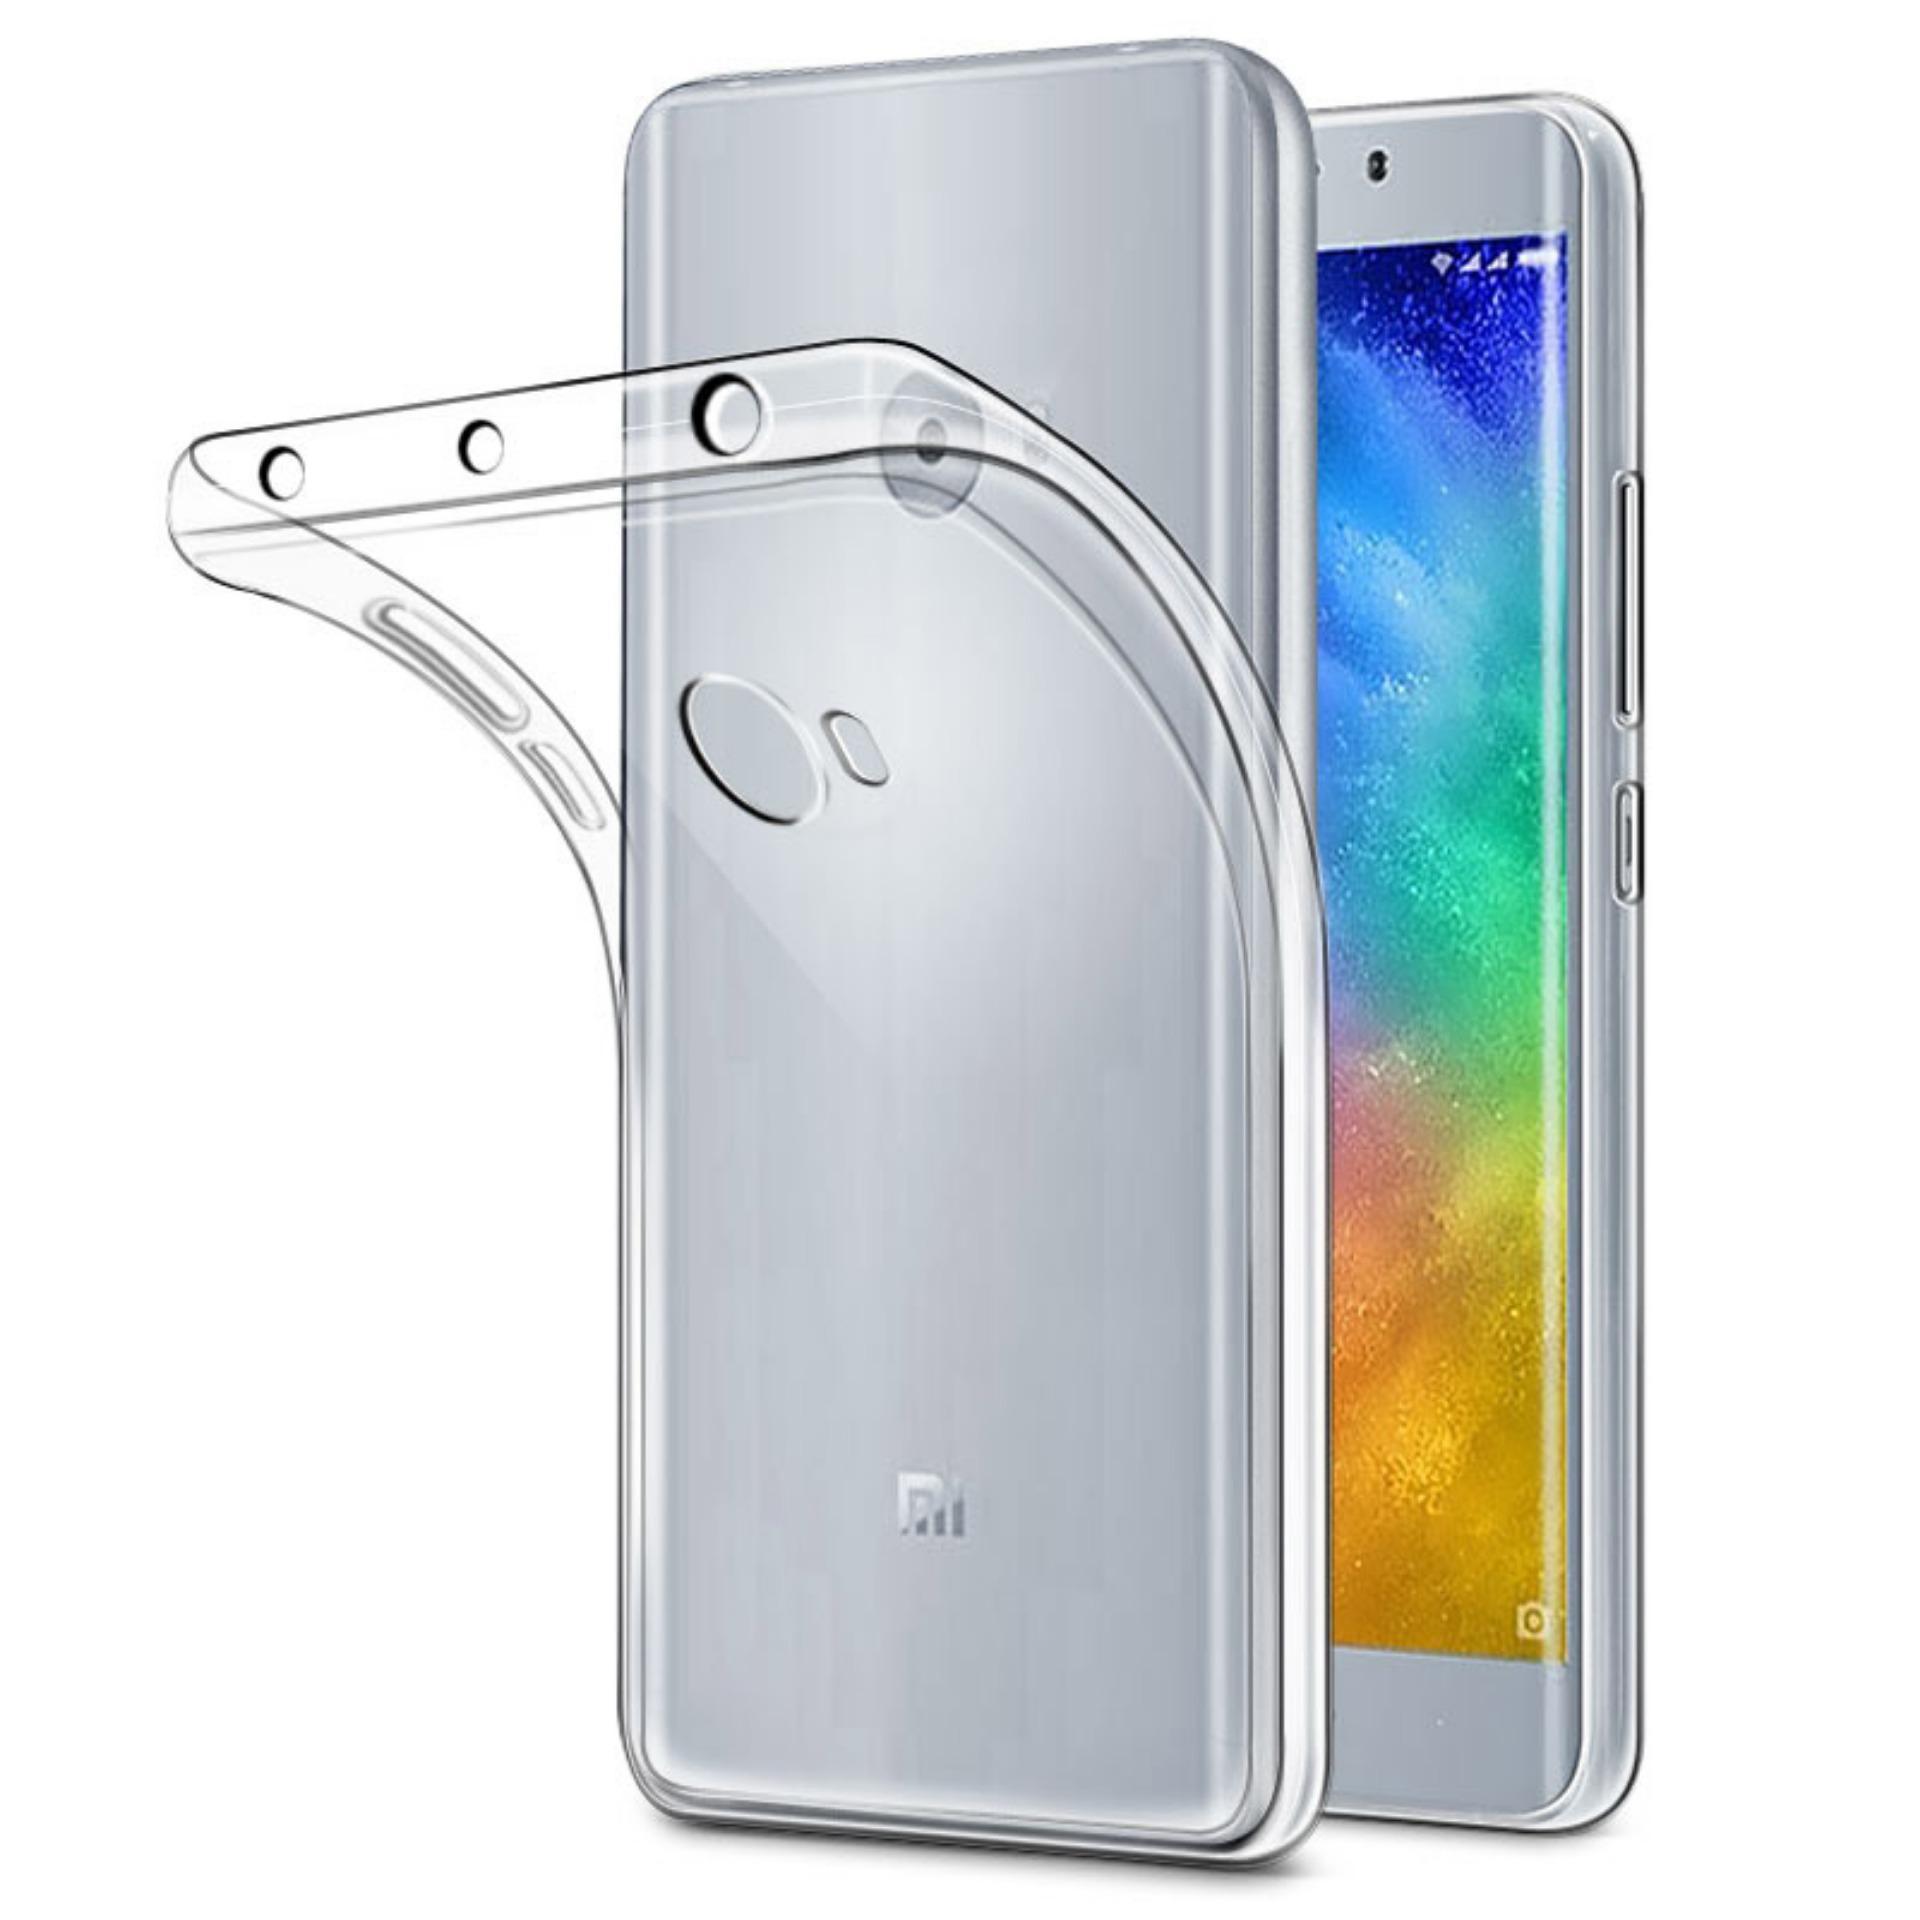 Softcase Xiaomi Redmi Note 4 Ultrathin Aircase Abu Trabsparant Headseat Putih Bendoel For Xioami Xiomi Mi 2 Anti Crash